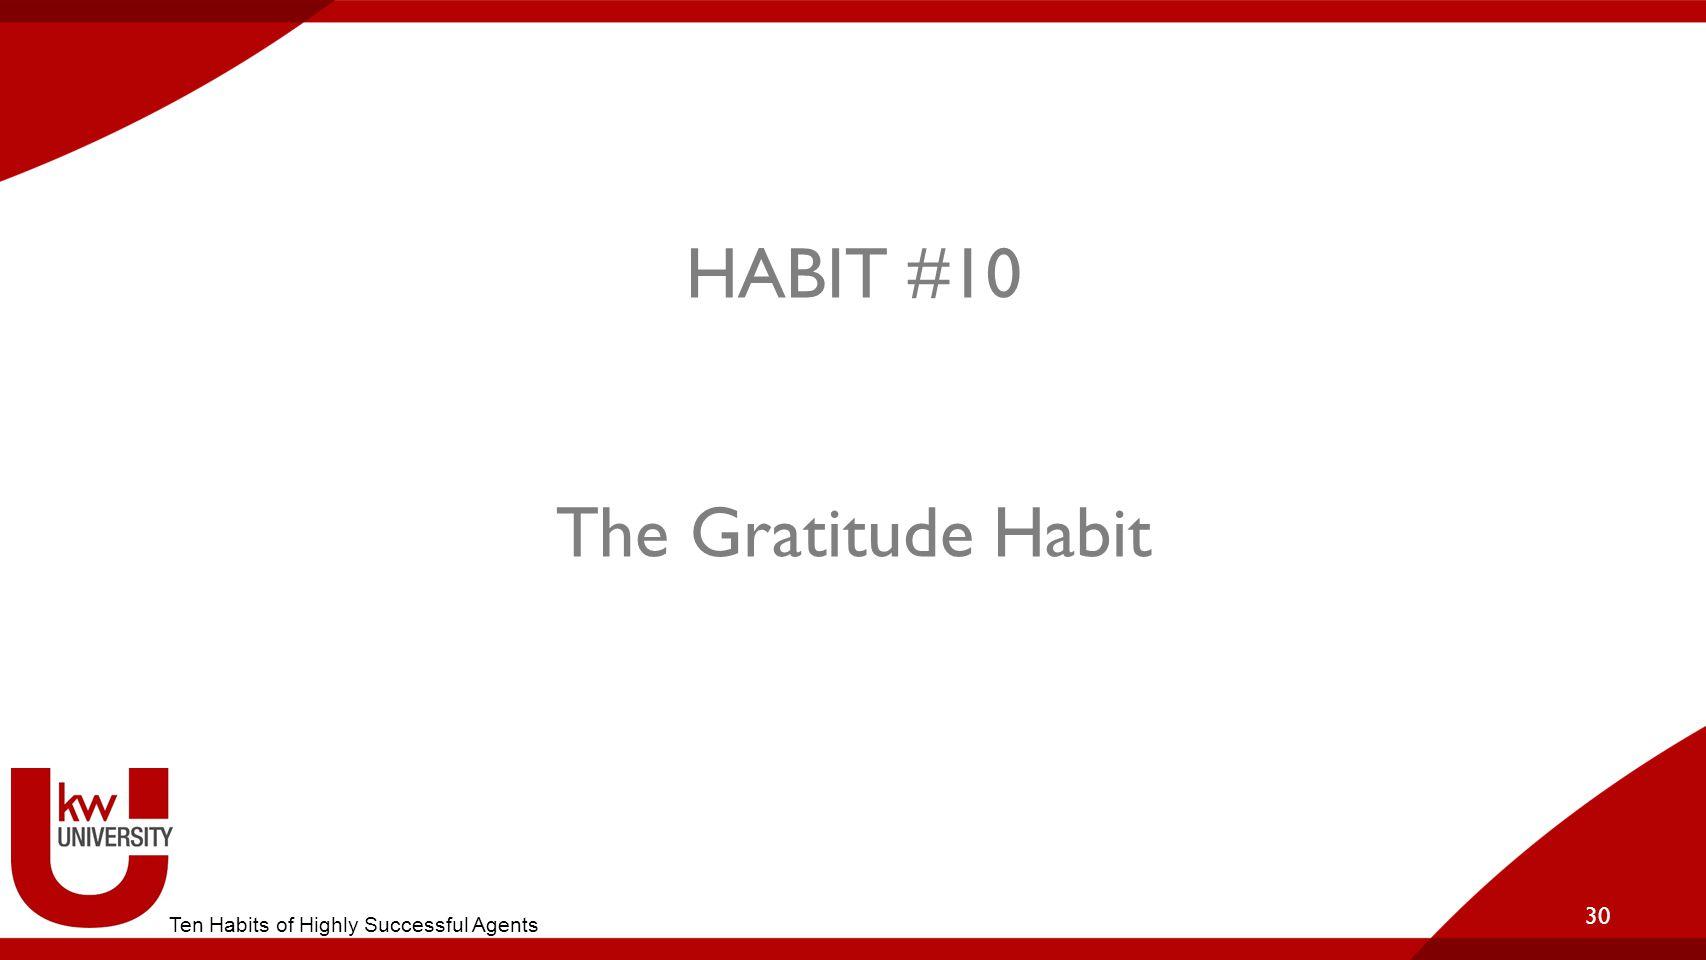 HABIT #10 The Gratitude Habit